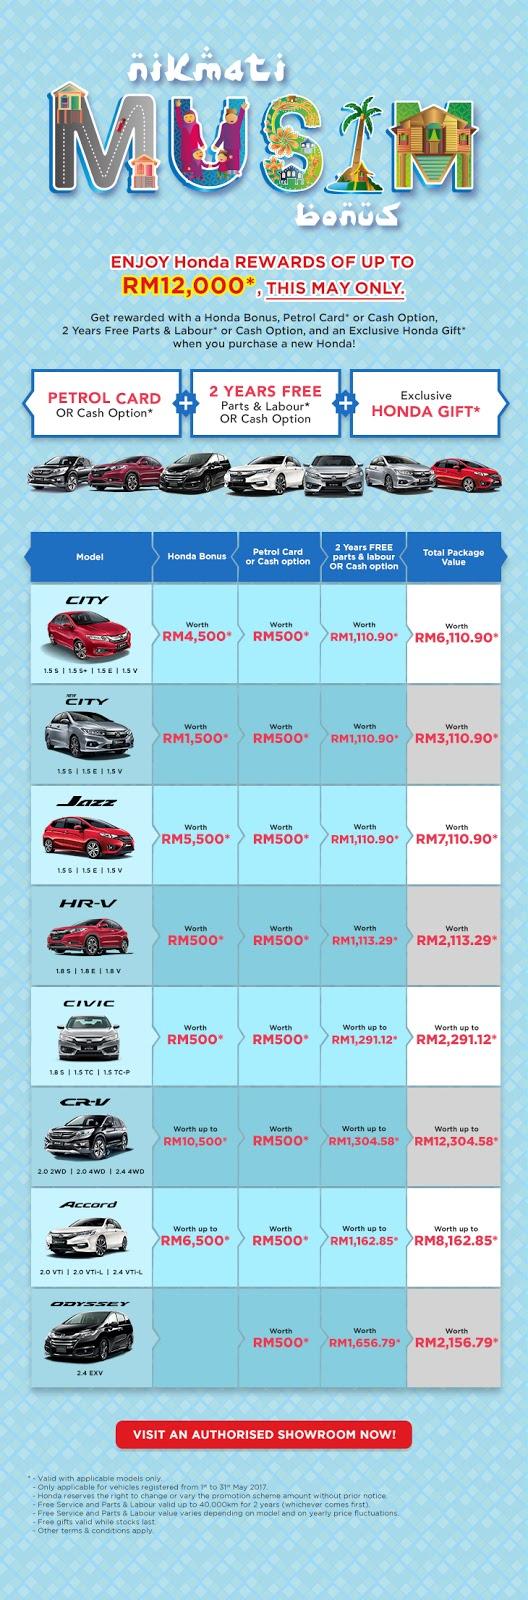 Honda Malaysia Rewards Discount Promo